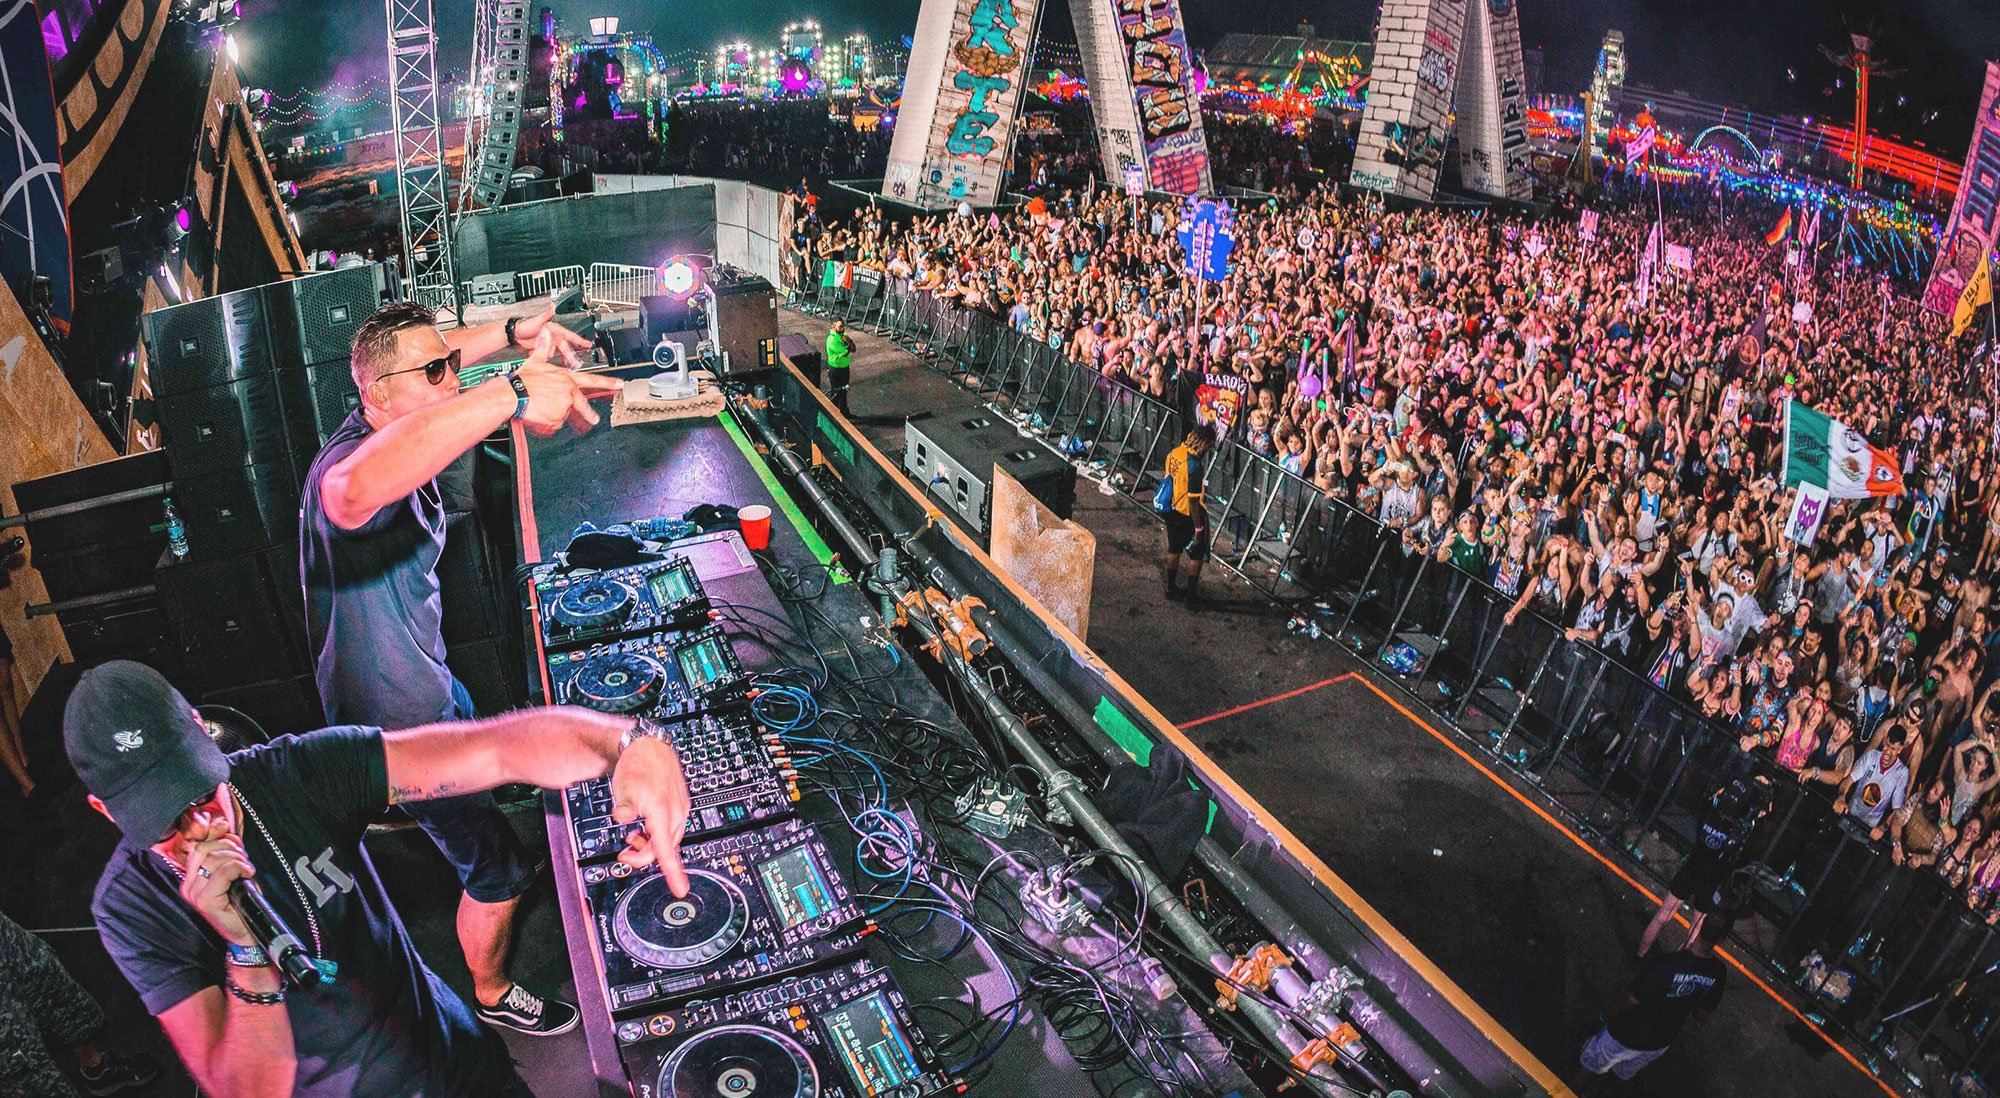 DJ Festival drone footage marketing